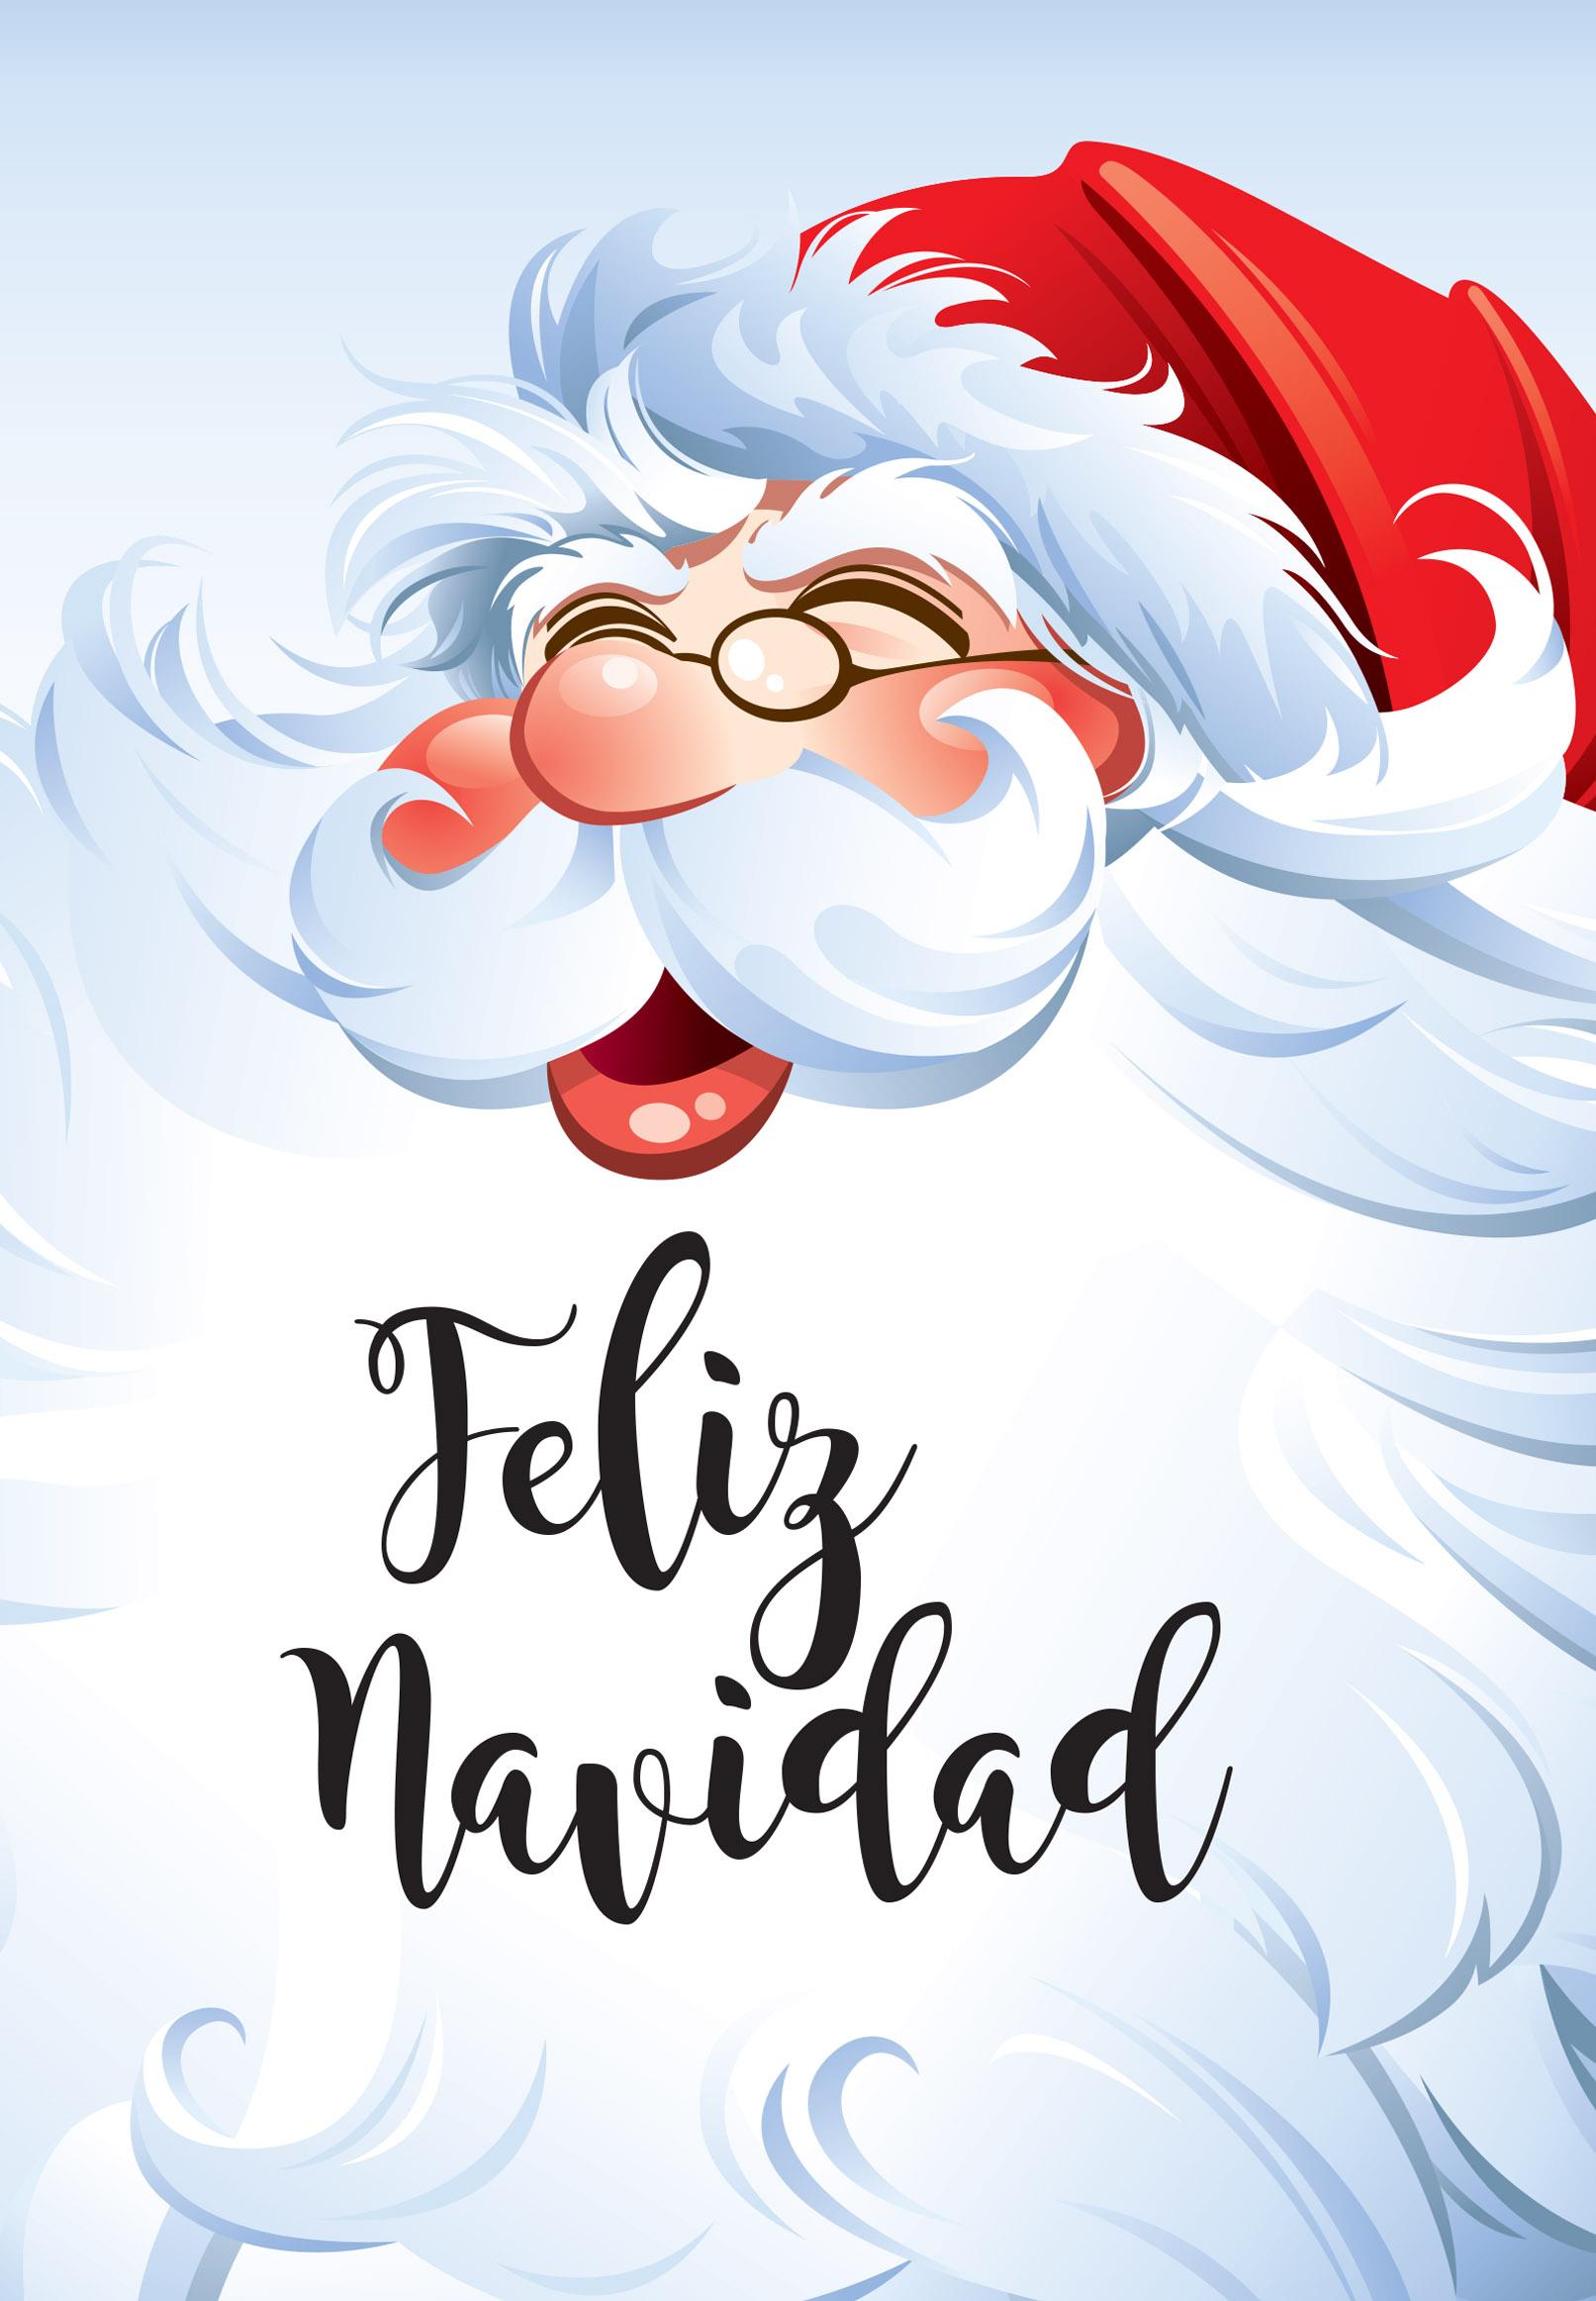 wholesale Spanish language Christmas greeting cards